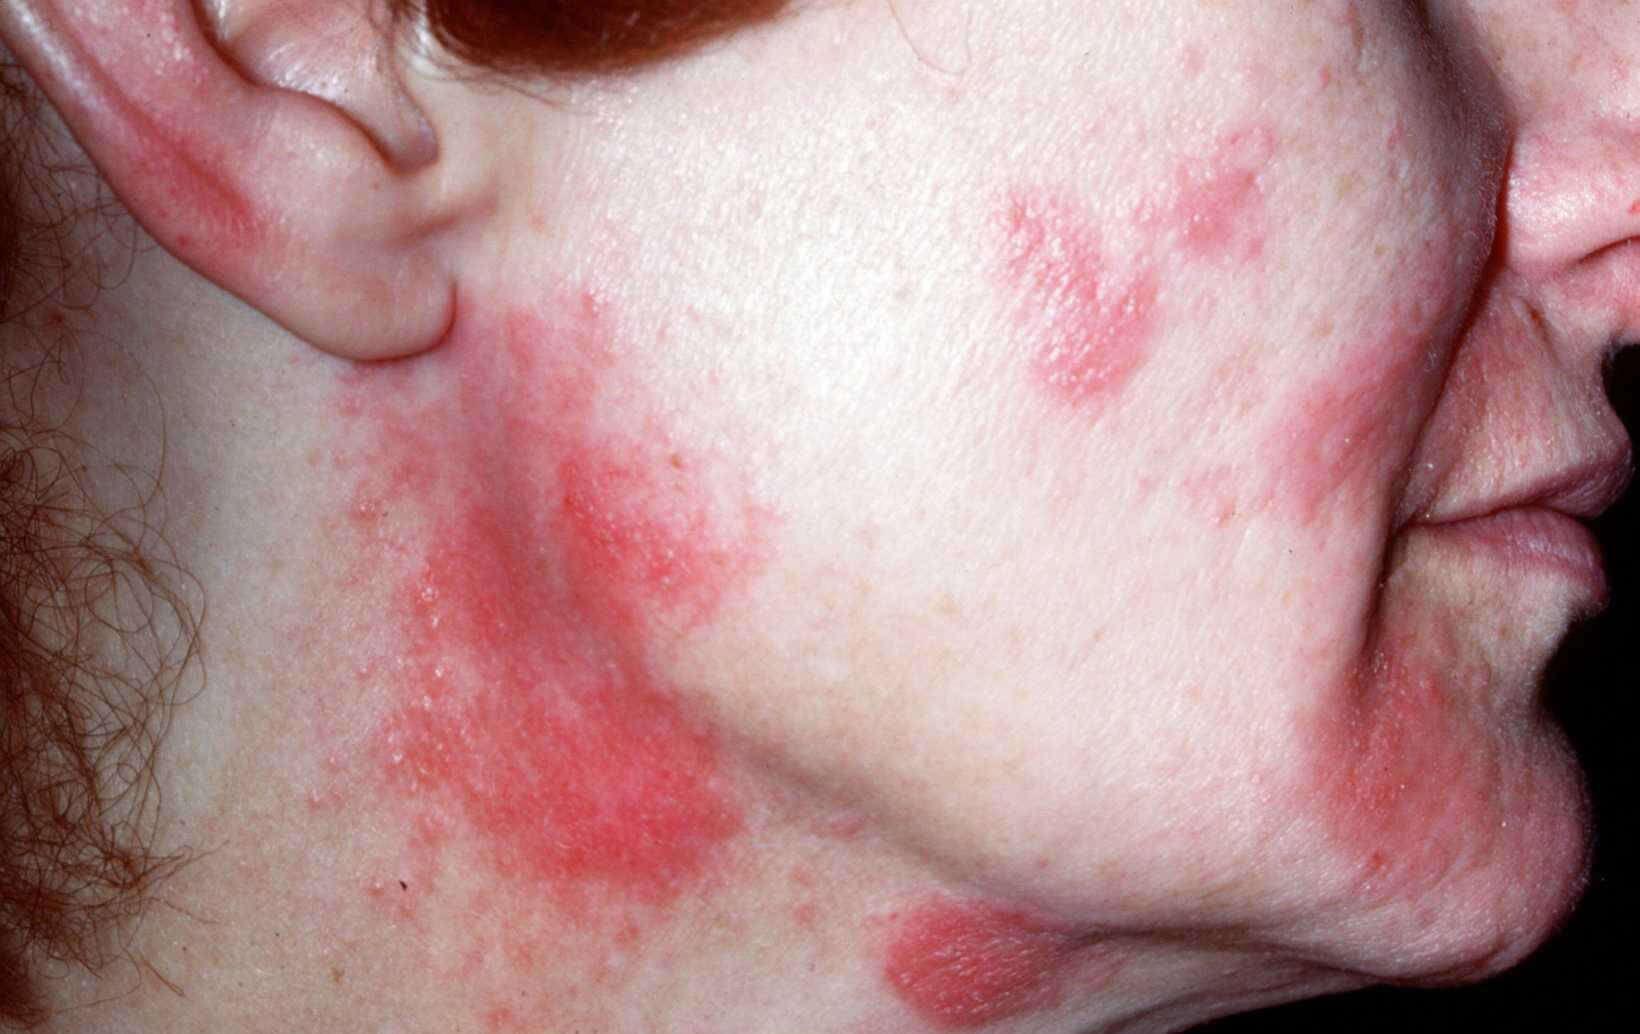 allergie parfum symptomen